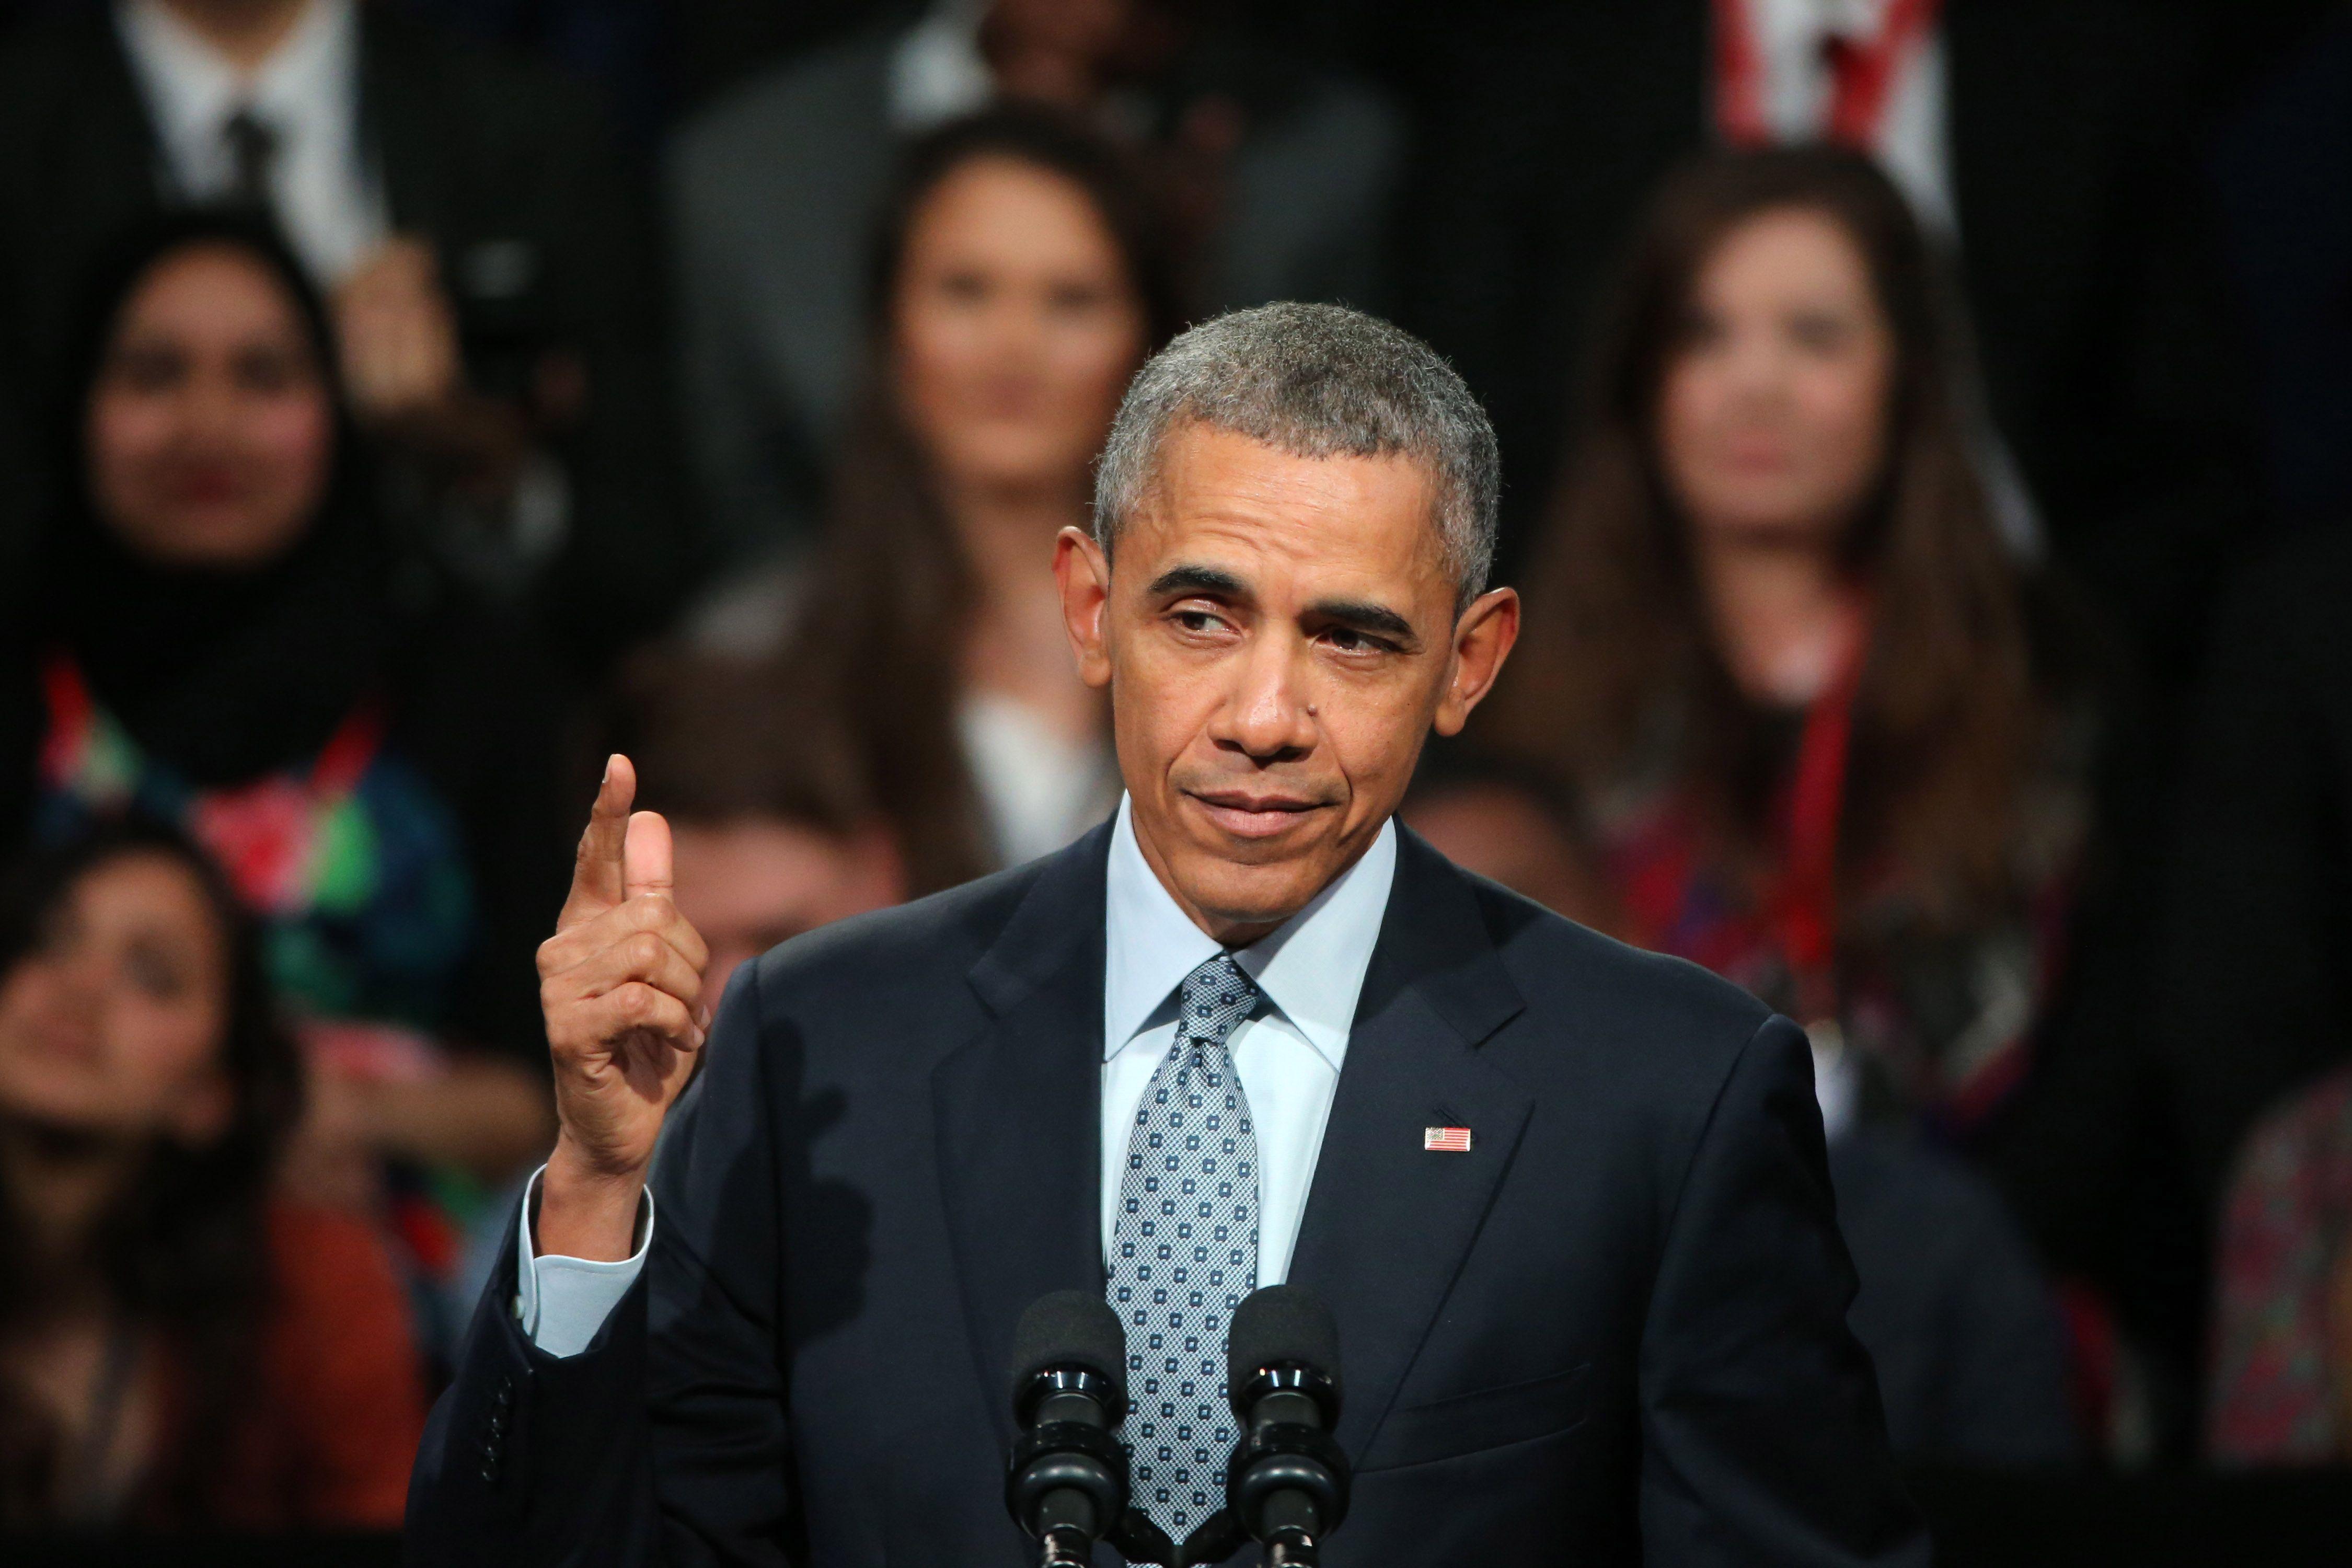 George R R Martin - Barack Obama Game of Thrones Cameo